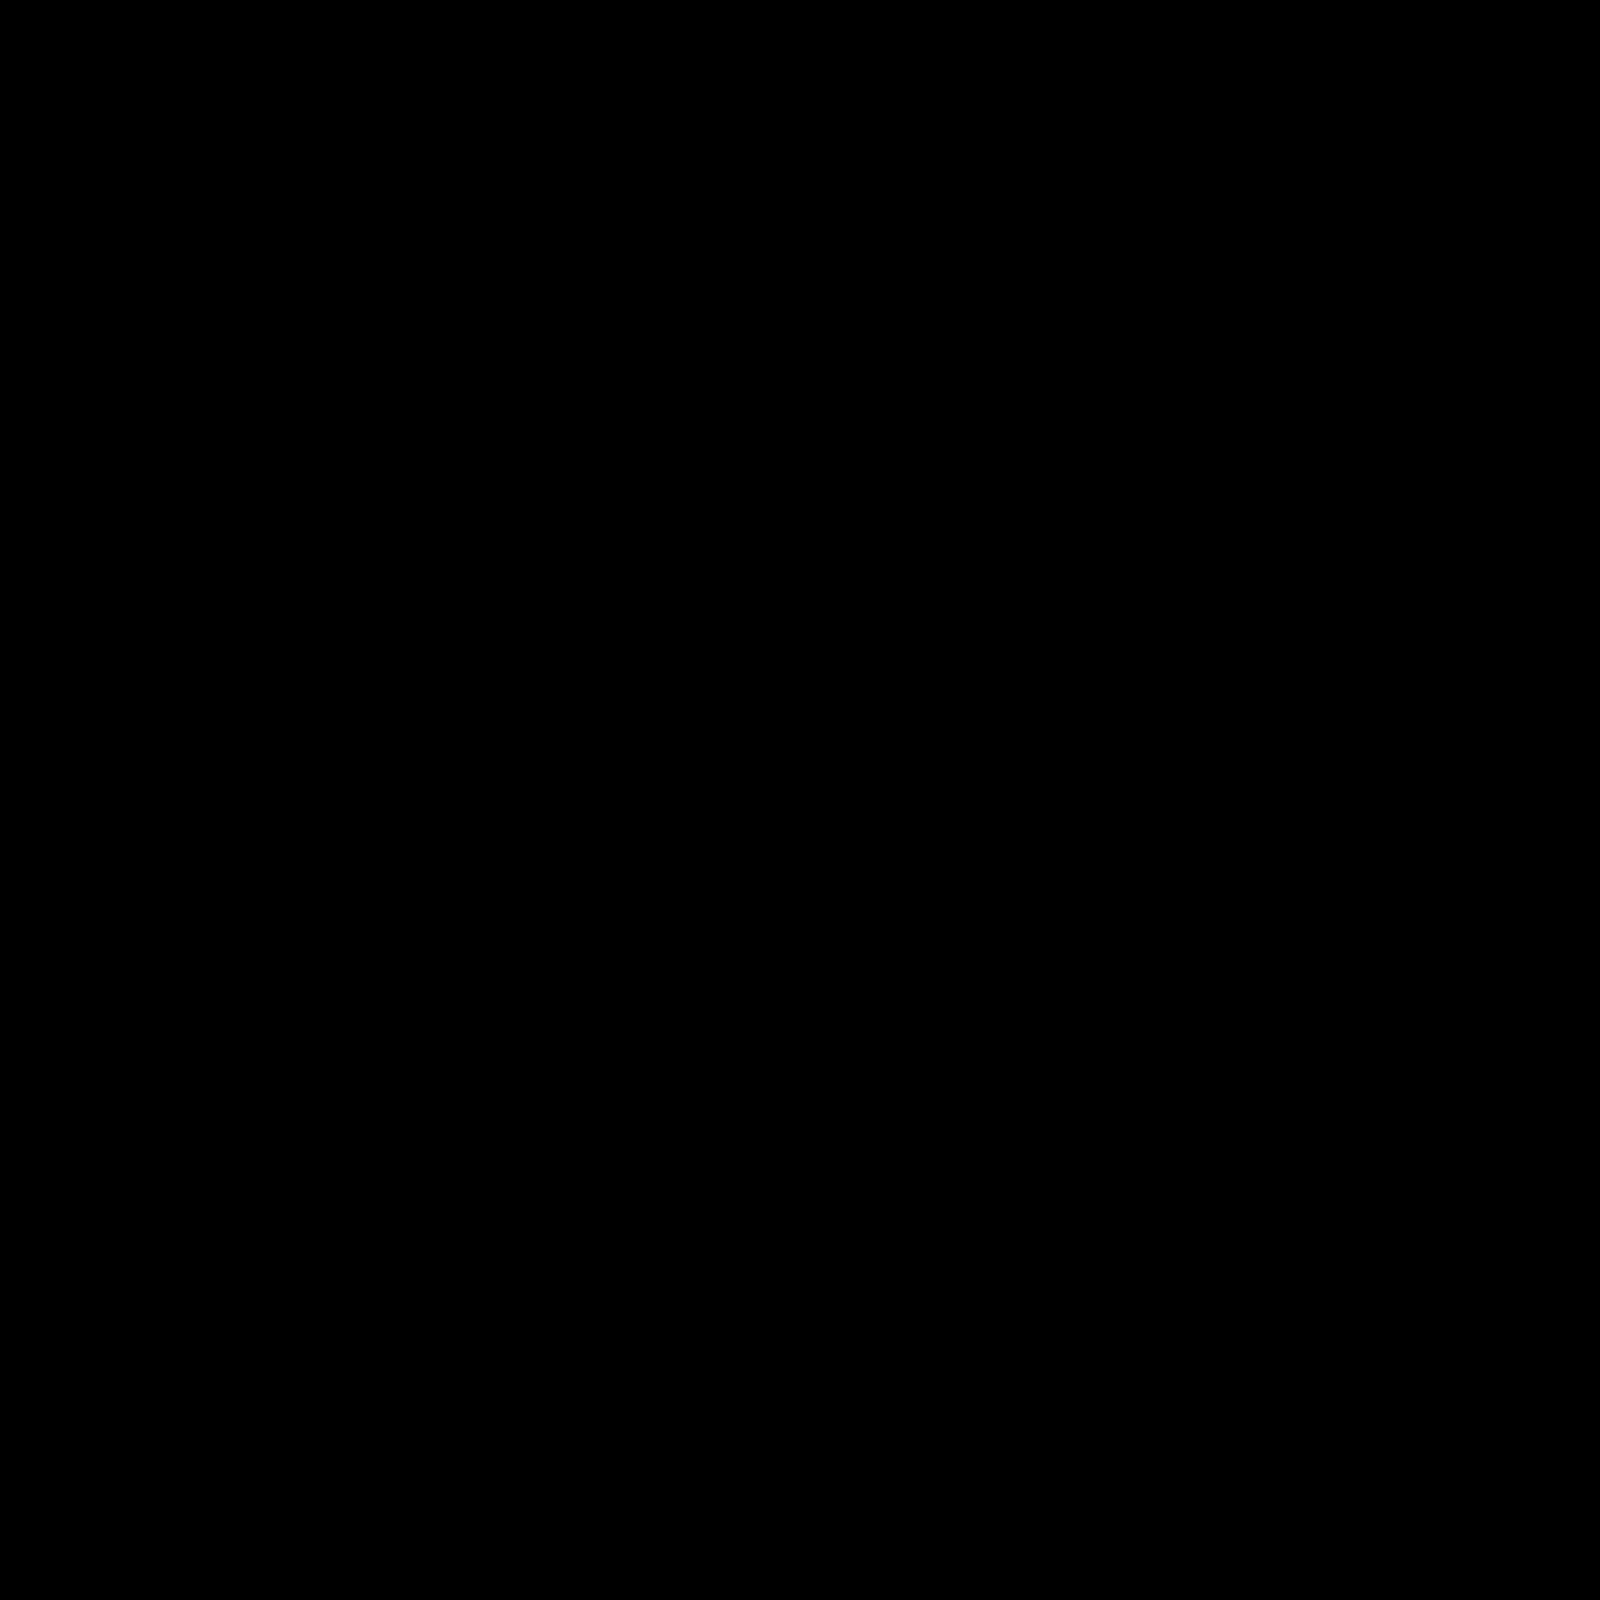 Human Figure Outline Svg Vector Human Figure Outline Clip Art Svg Clipart